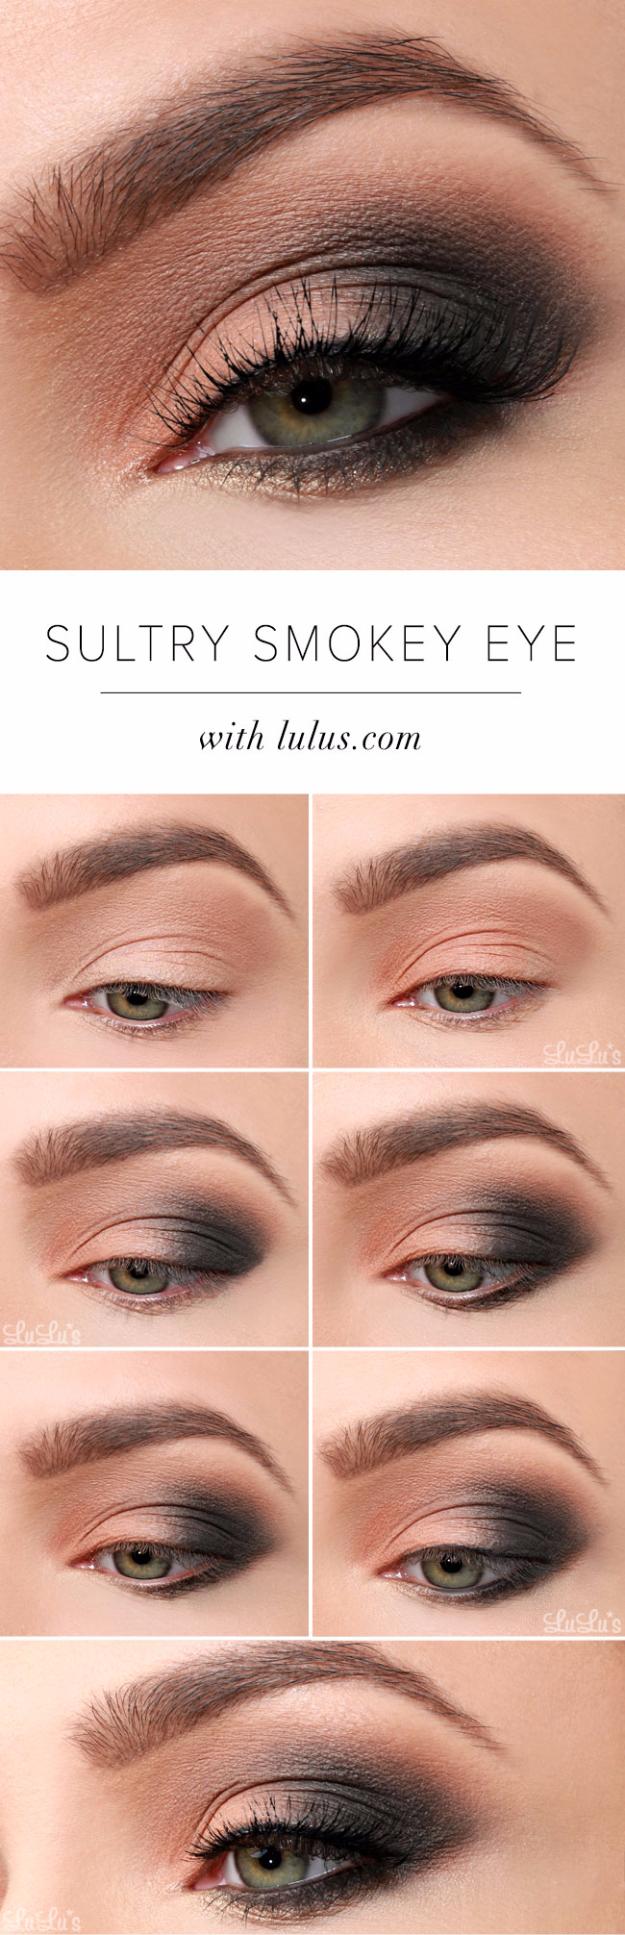 12 Cool Makeup Hacks